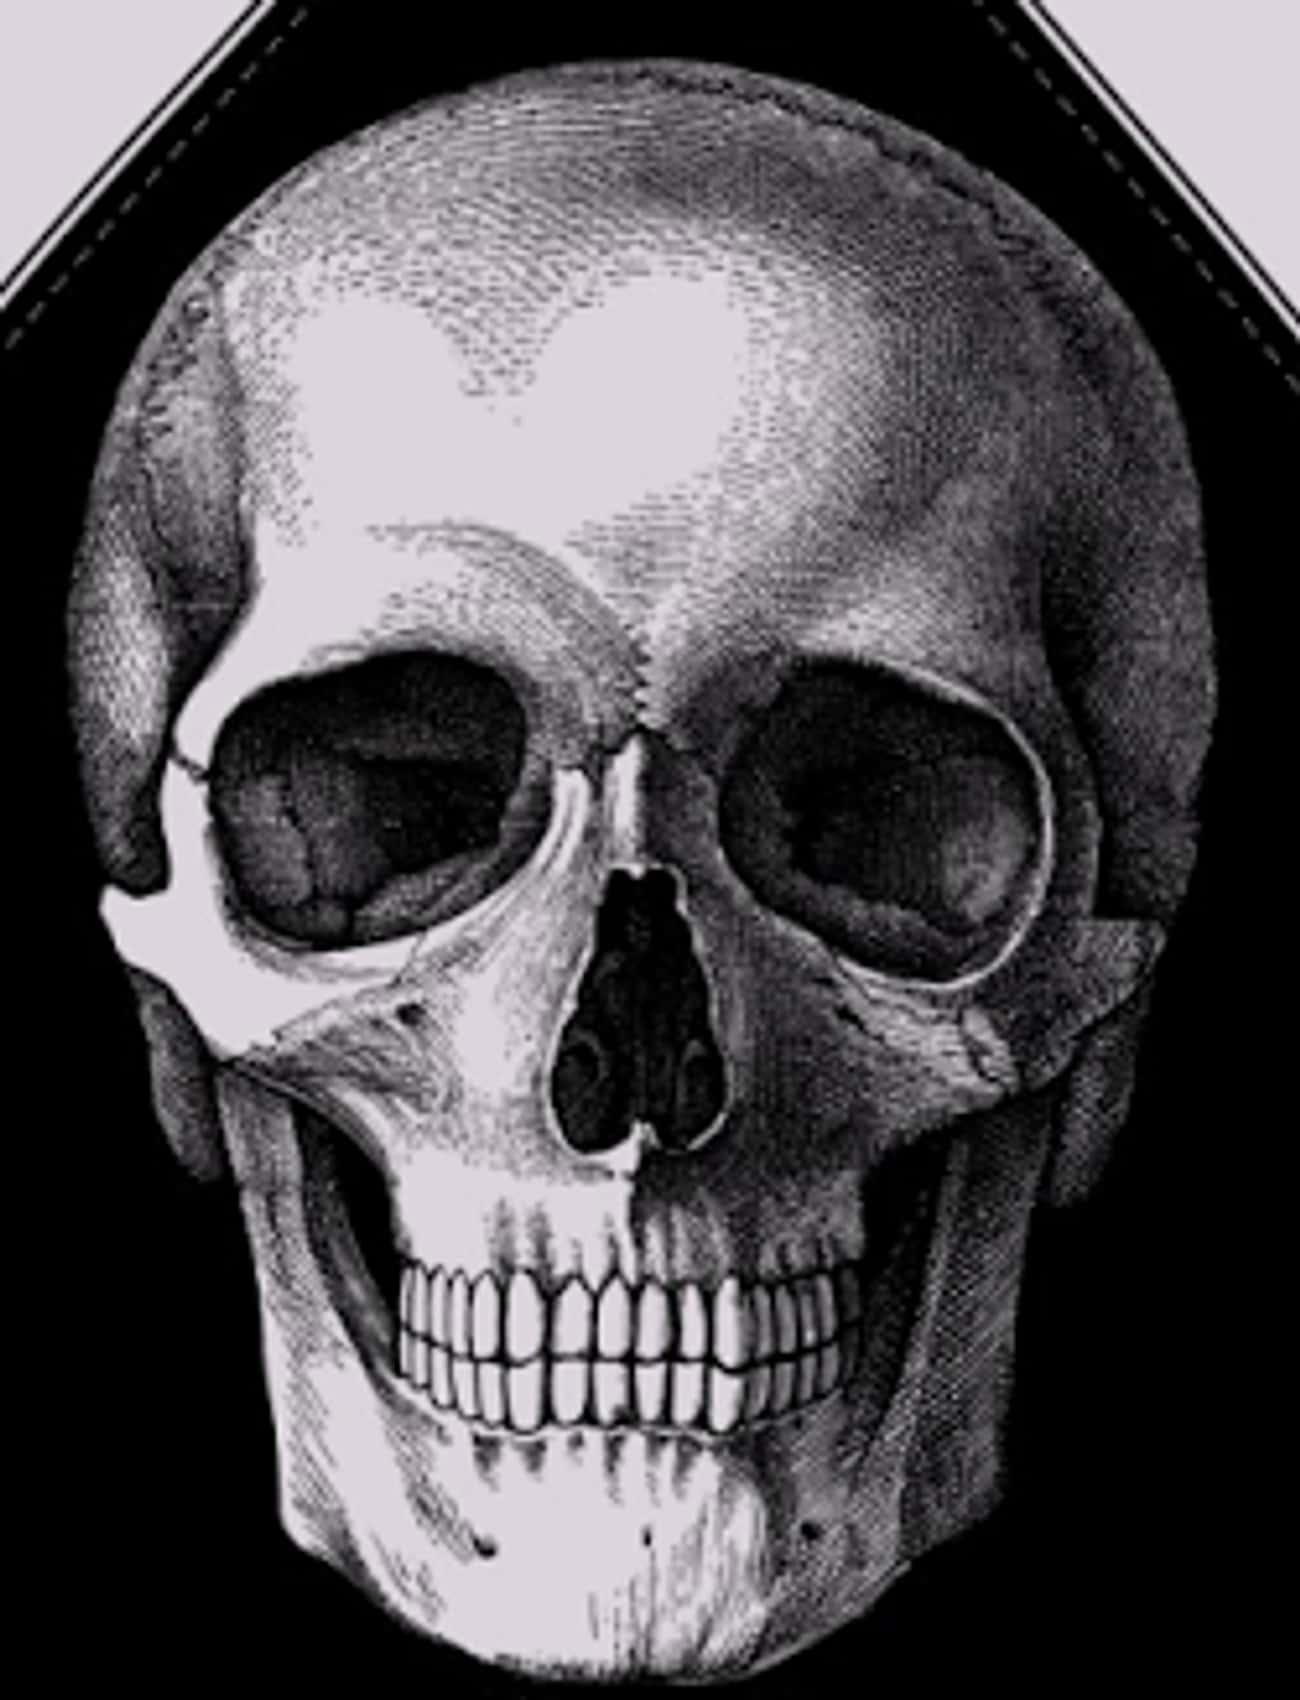 Crosses And Skulls Between The Eyes